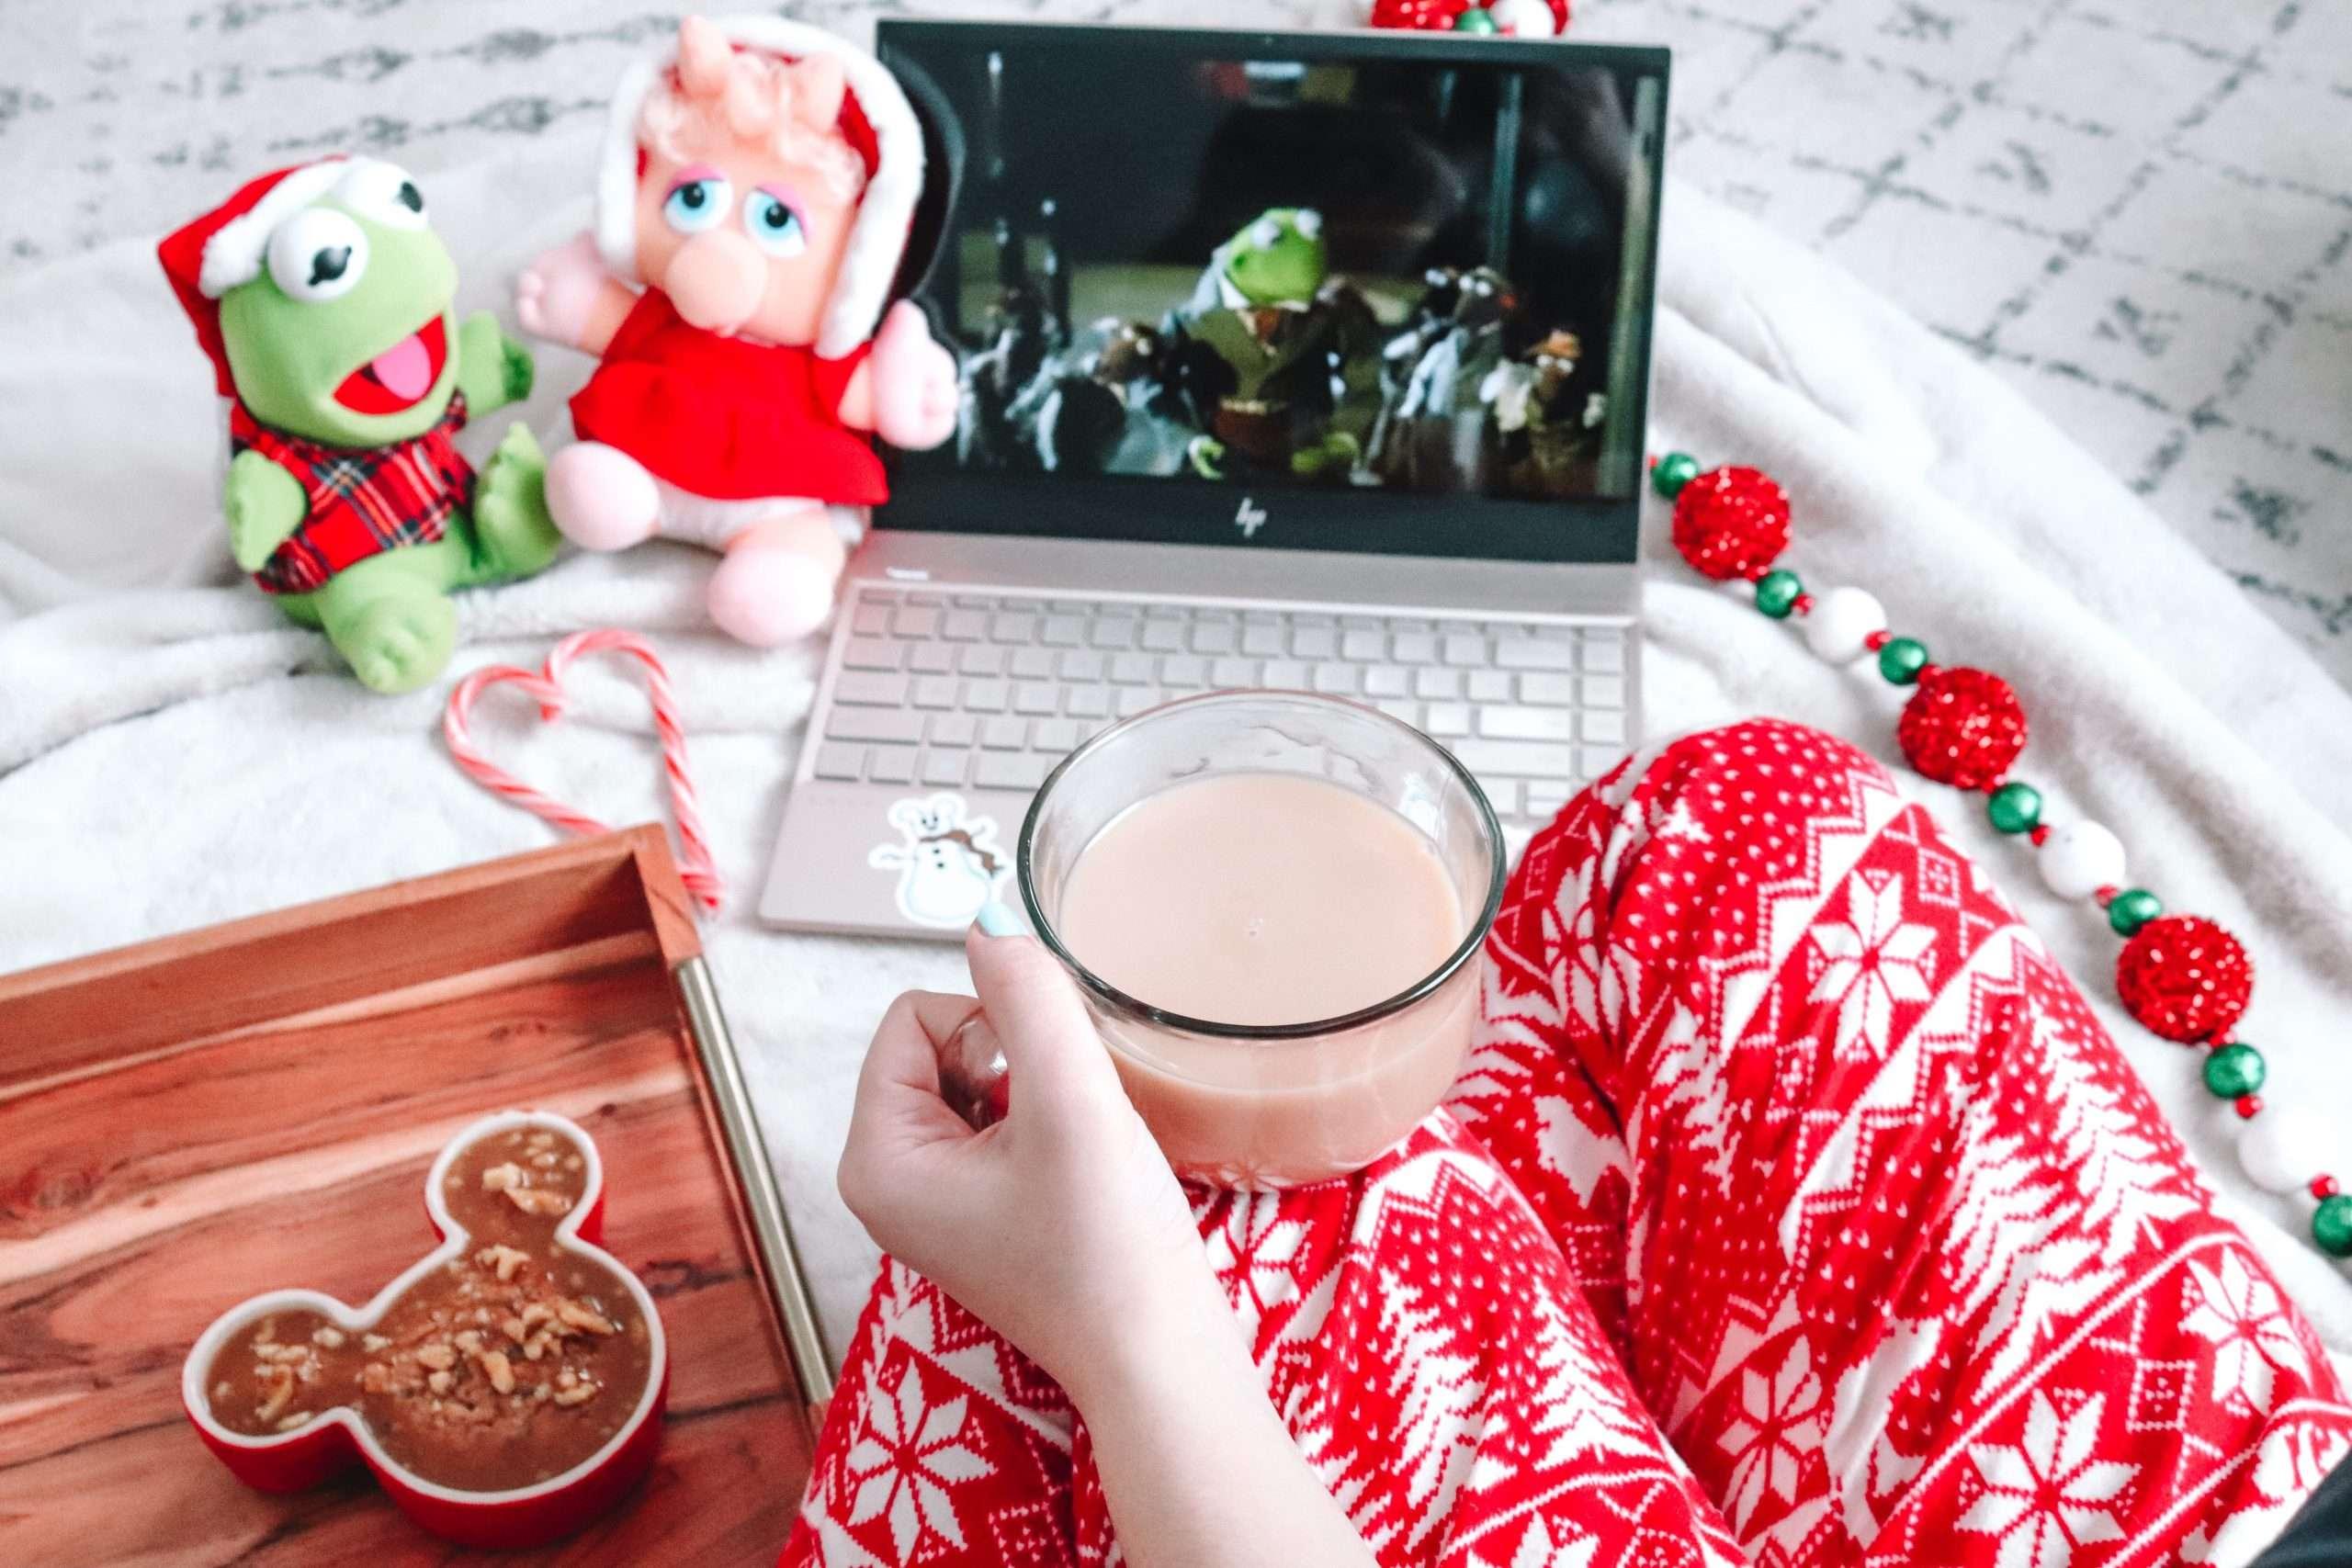 A Muppets Christmas Movies Marathon